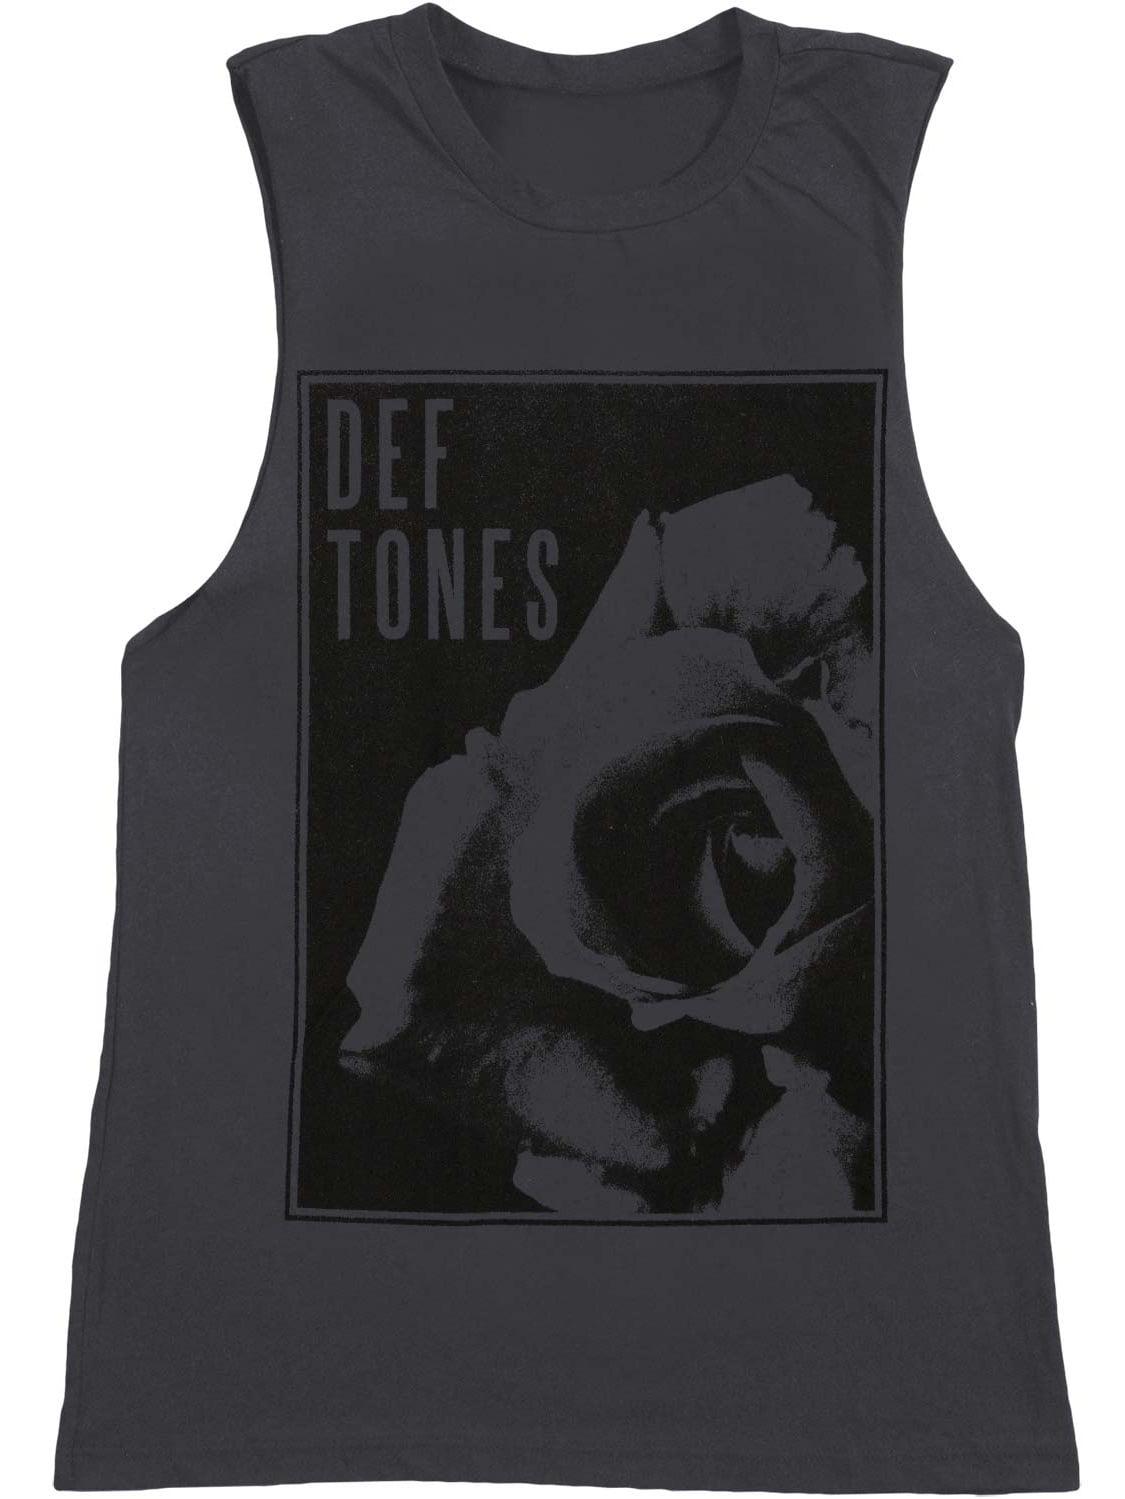 DEFTONES LOGO 2 Men/'s T-shirt Long Sleeve Shirt Tank Top Vest